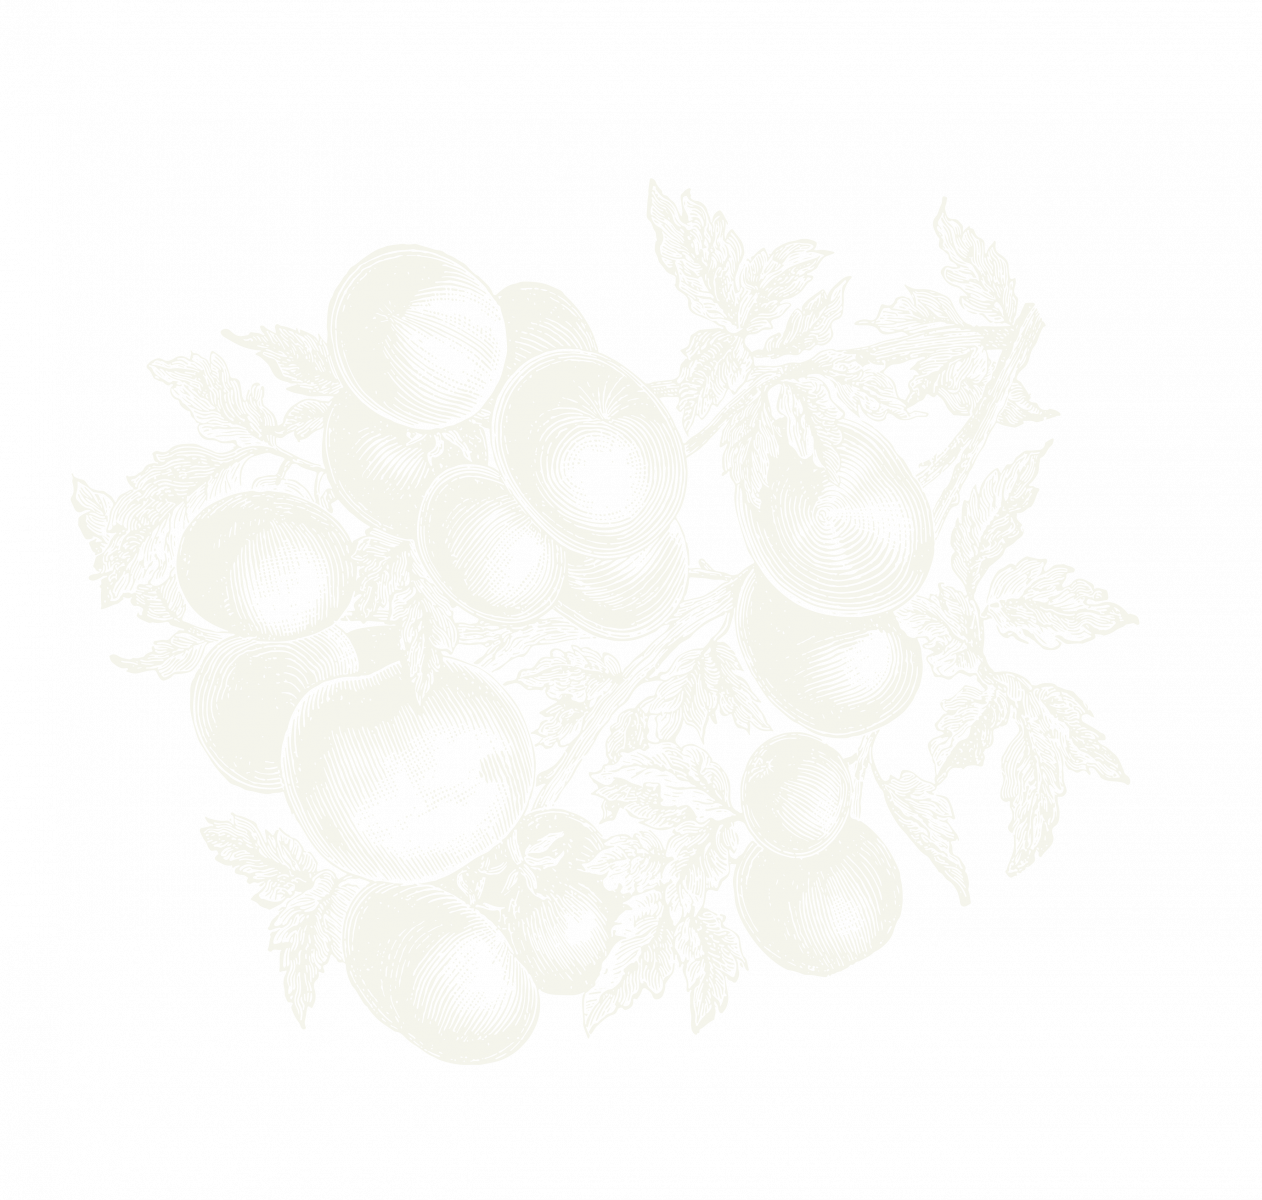 Vegetable illustration of greens